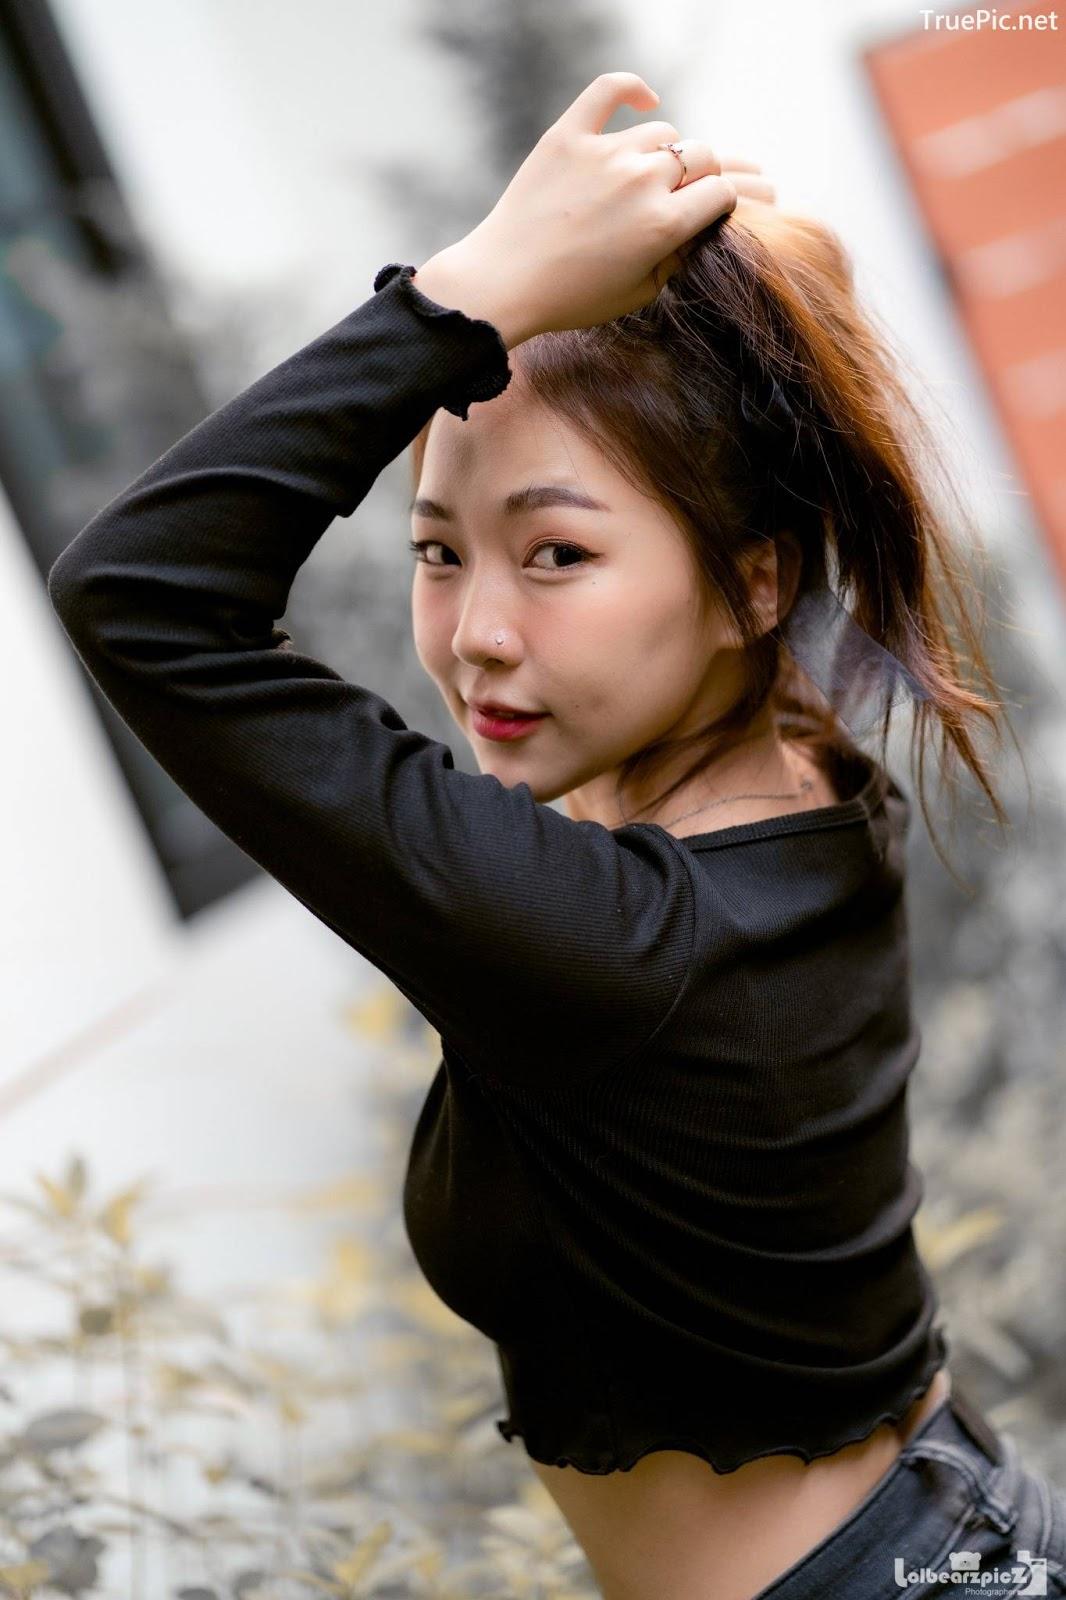 Image Thailand Model - Sunna Dewa - Cute Naughty Girl - TruePic.net - Picture-4